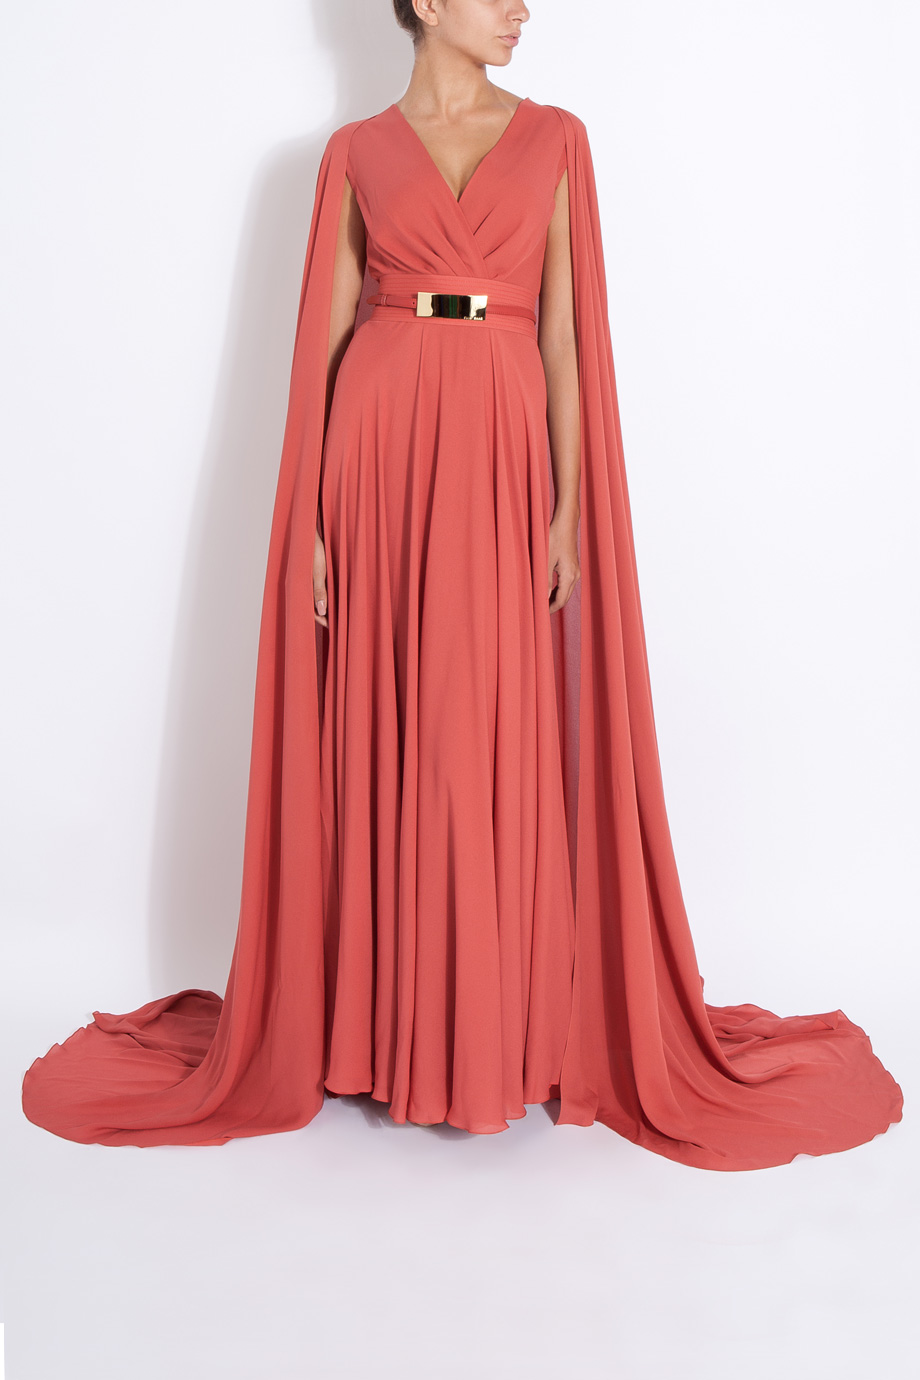 Lyst - Elie Saab Long Cap Detail Gown in Red